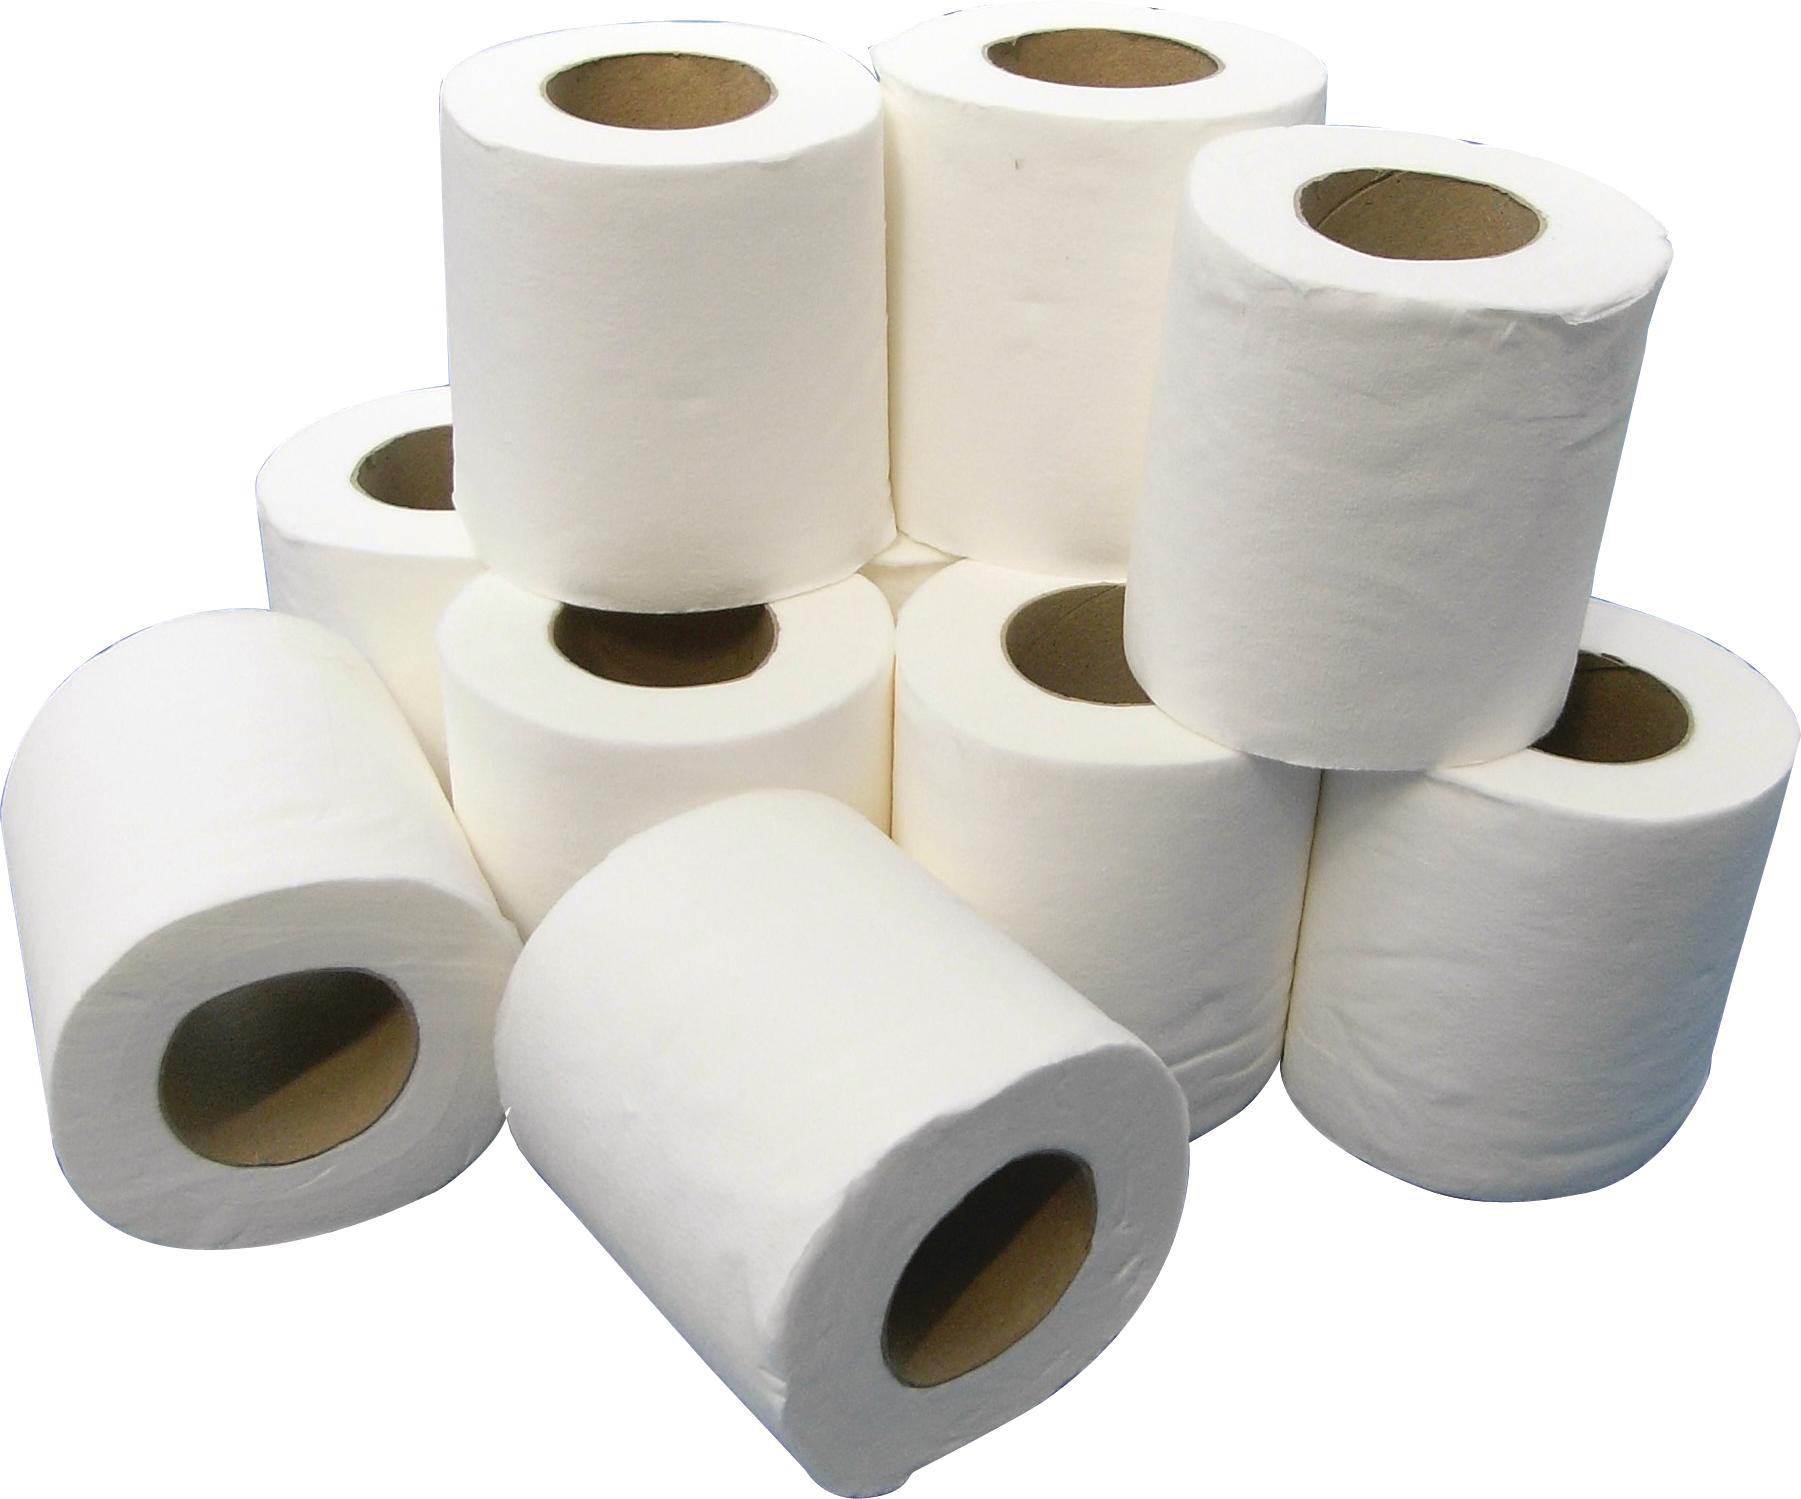 28 Toilet Paper Roller Bathroom Commandmants Making